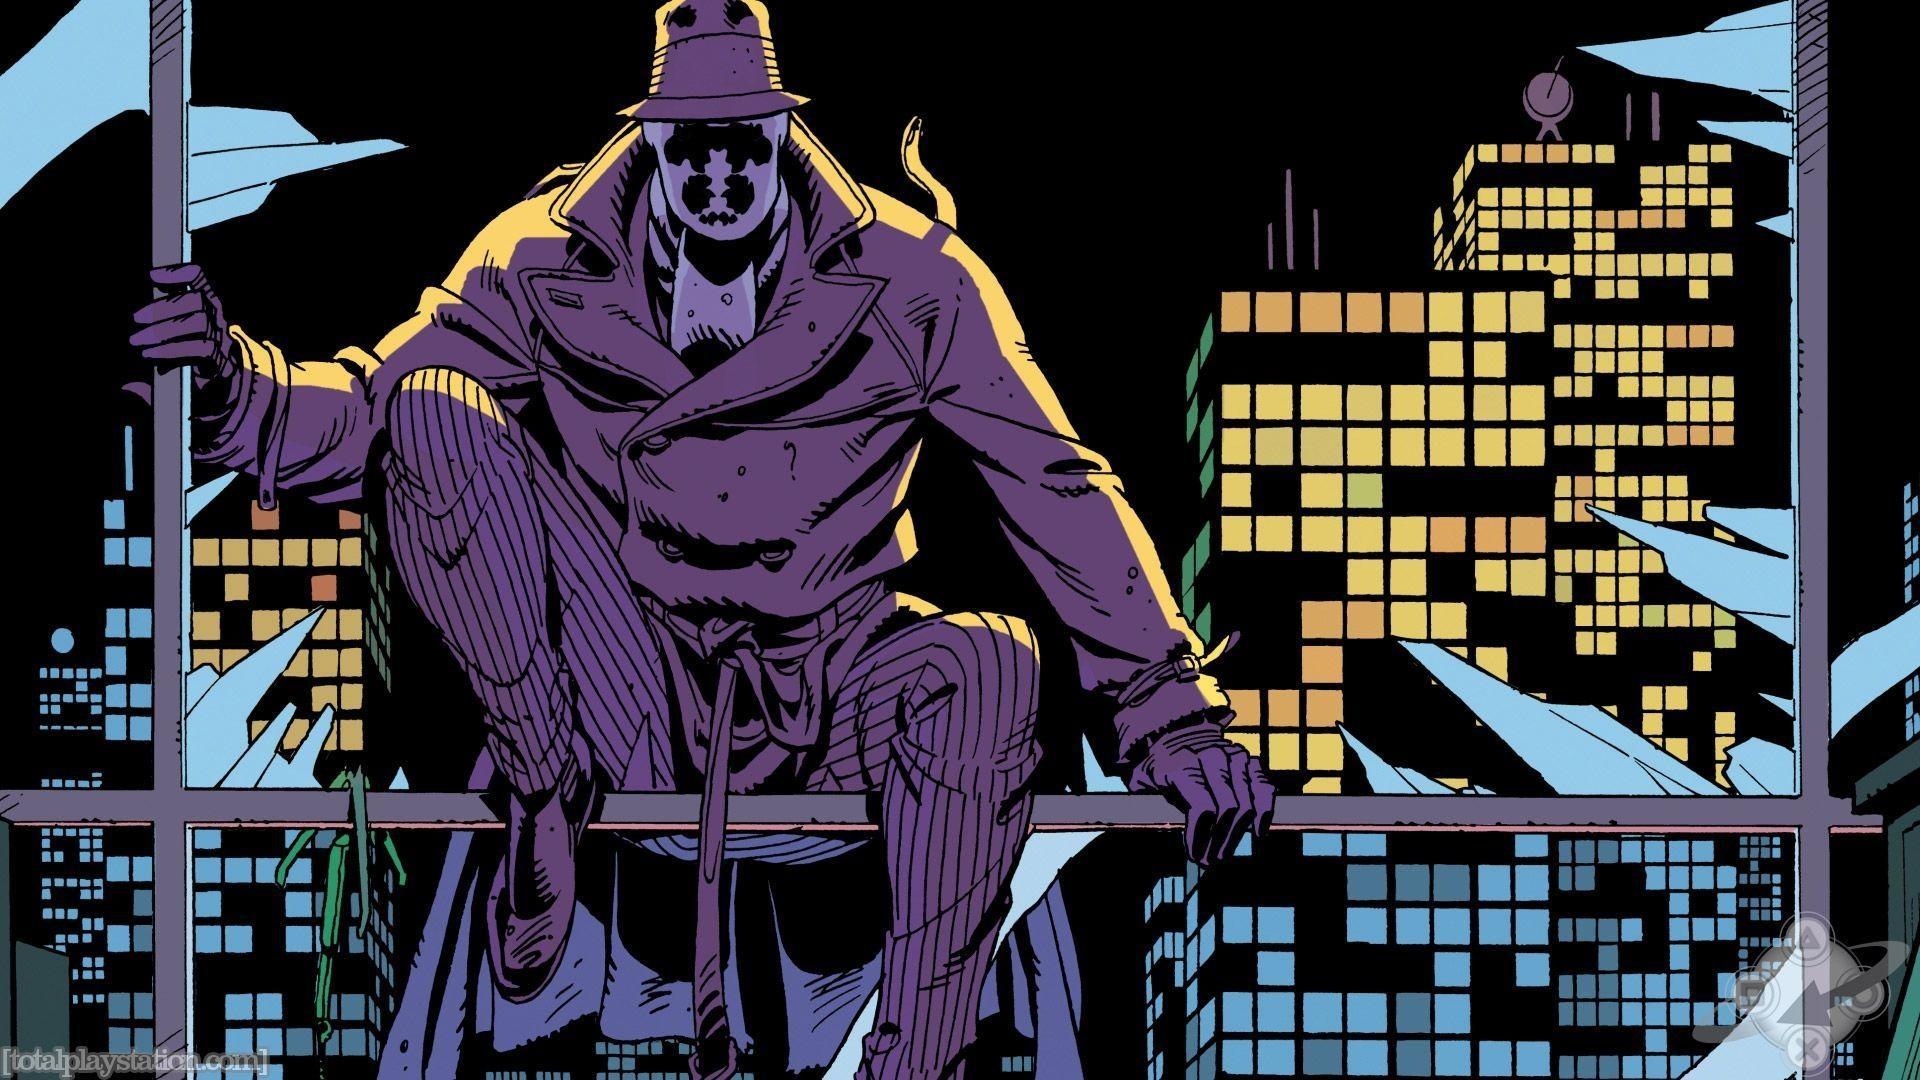 1920x1080 1920x1080 Rorschach Watchmen Comic Wallpaper | Superhero Wallpapers